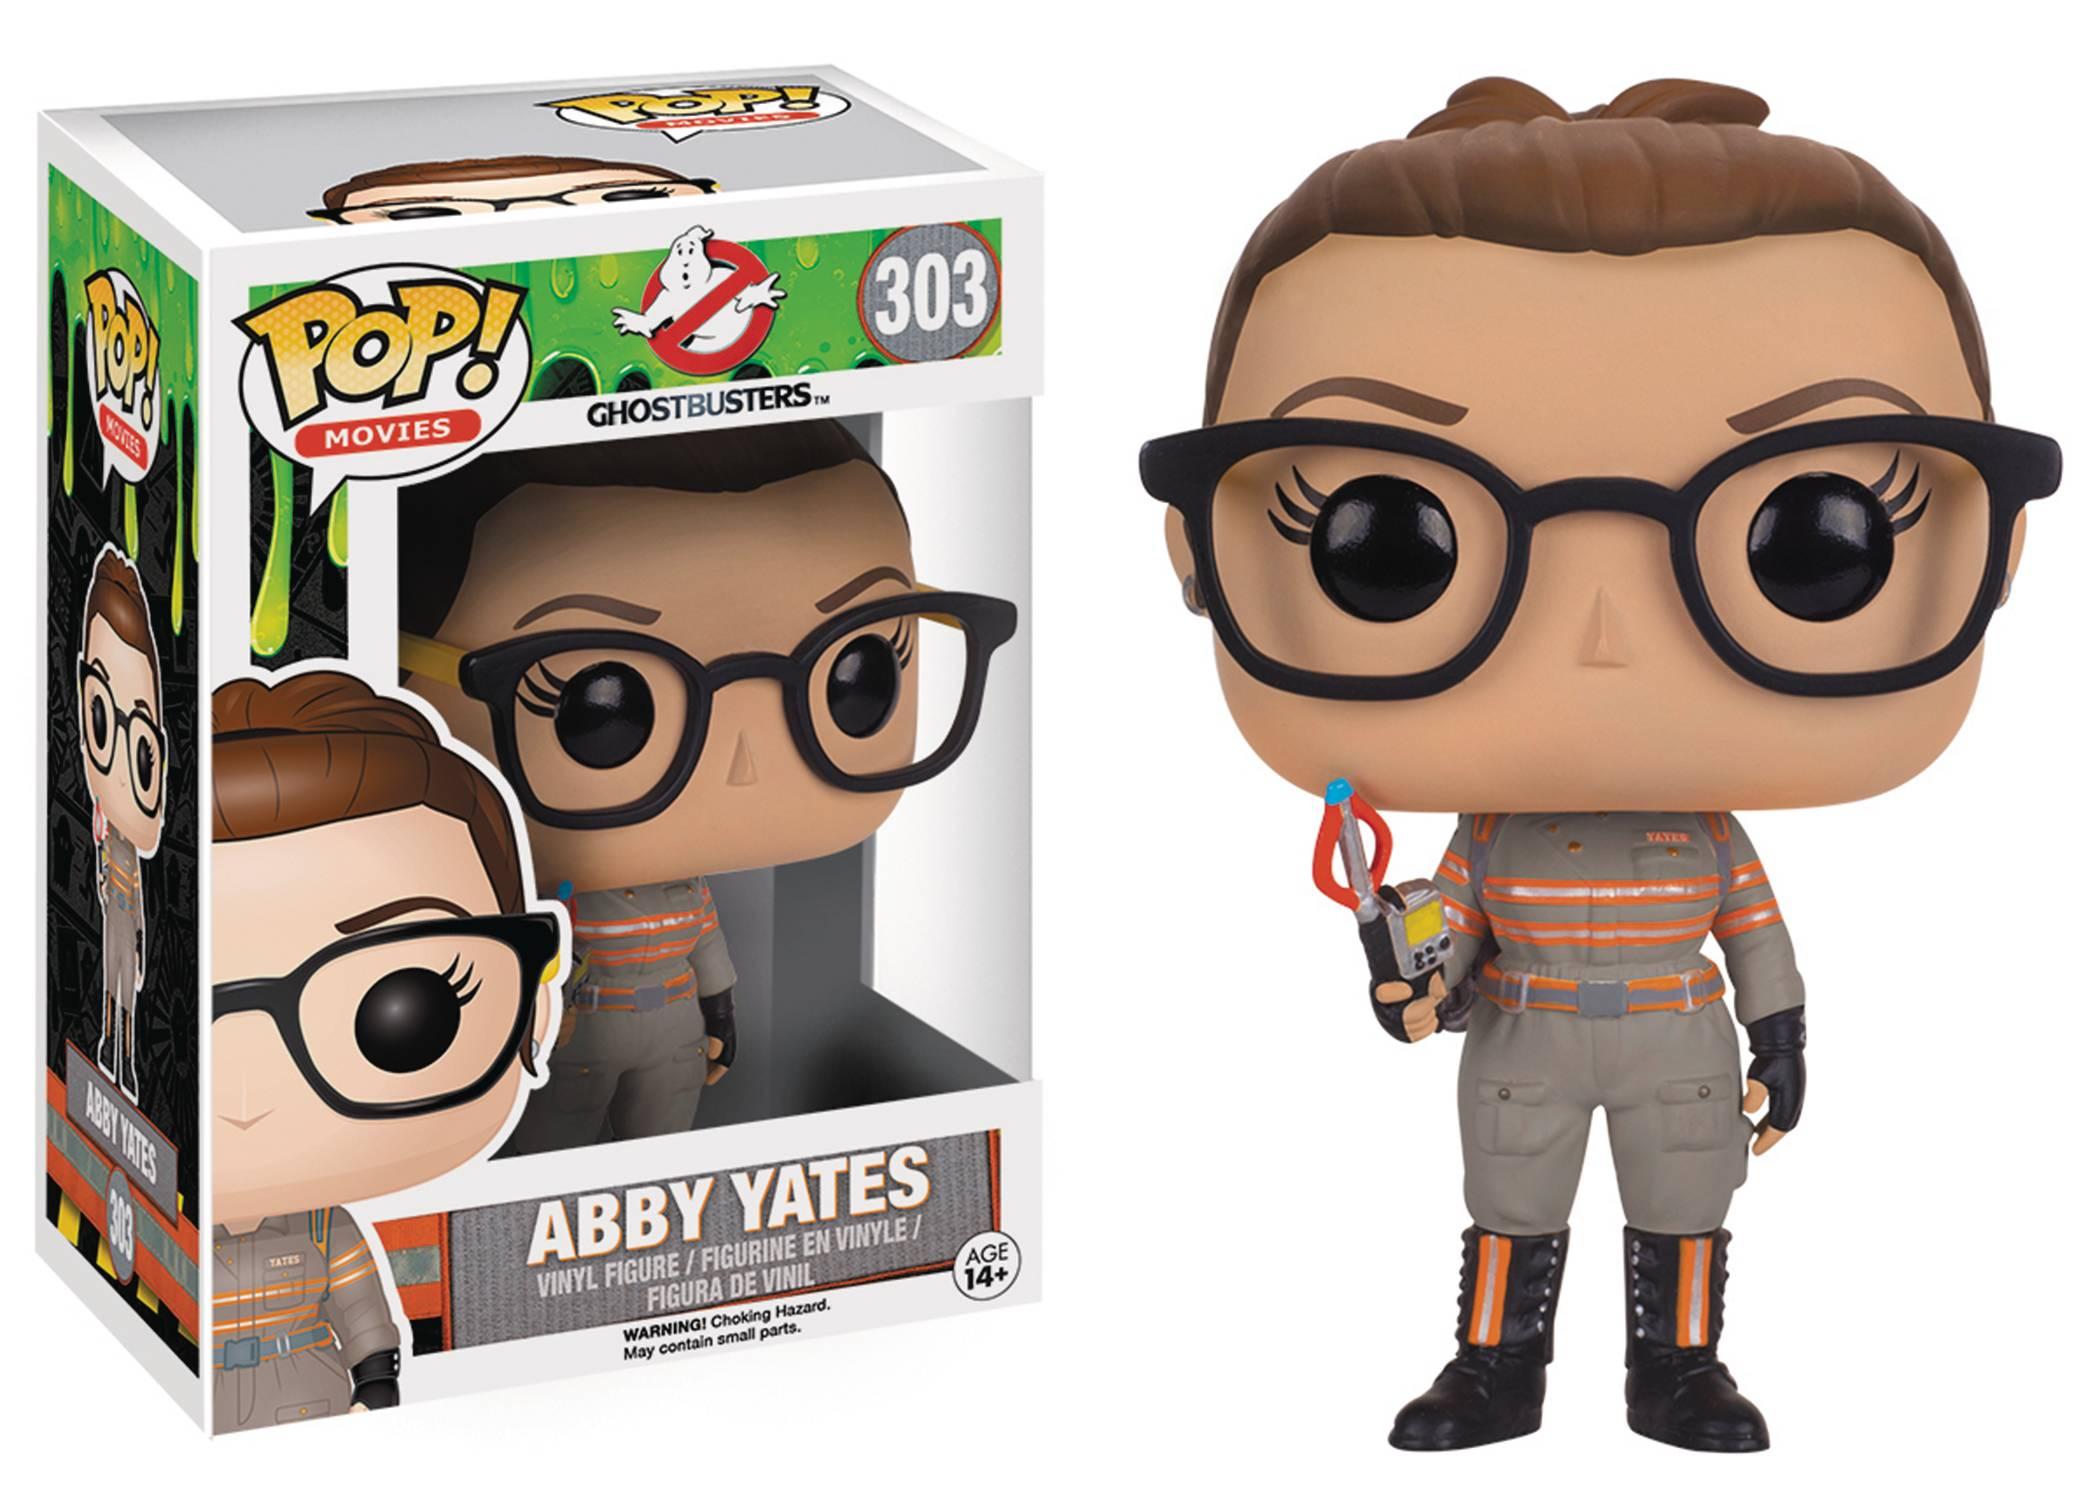 Ghostbusters 2016 Abby Yates Funko Pop Vinyl Shop